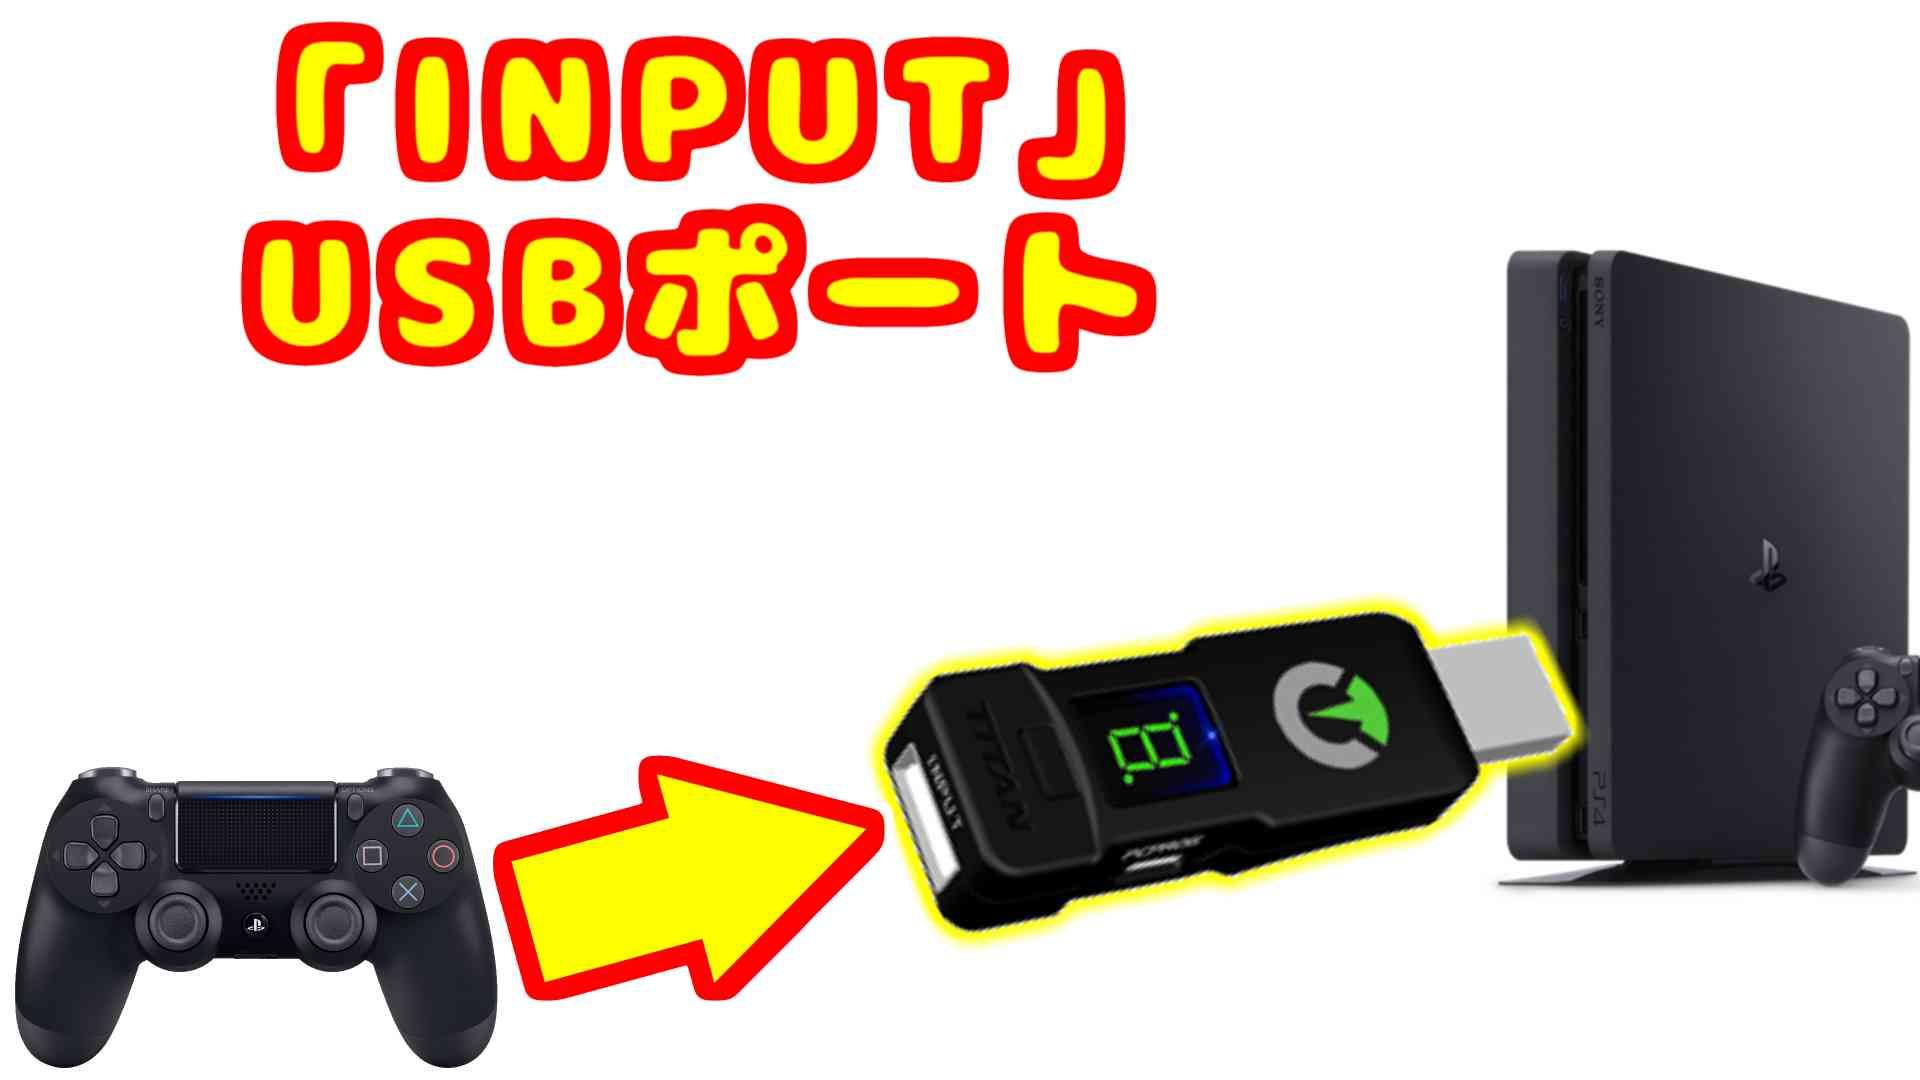 PS4のコントローラー認証を回避するために「Titan One」の「INPUT」USBポートにPS4用純正コントローラーを繋ぐ